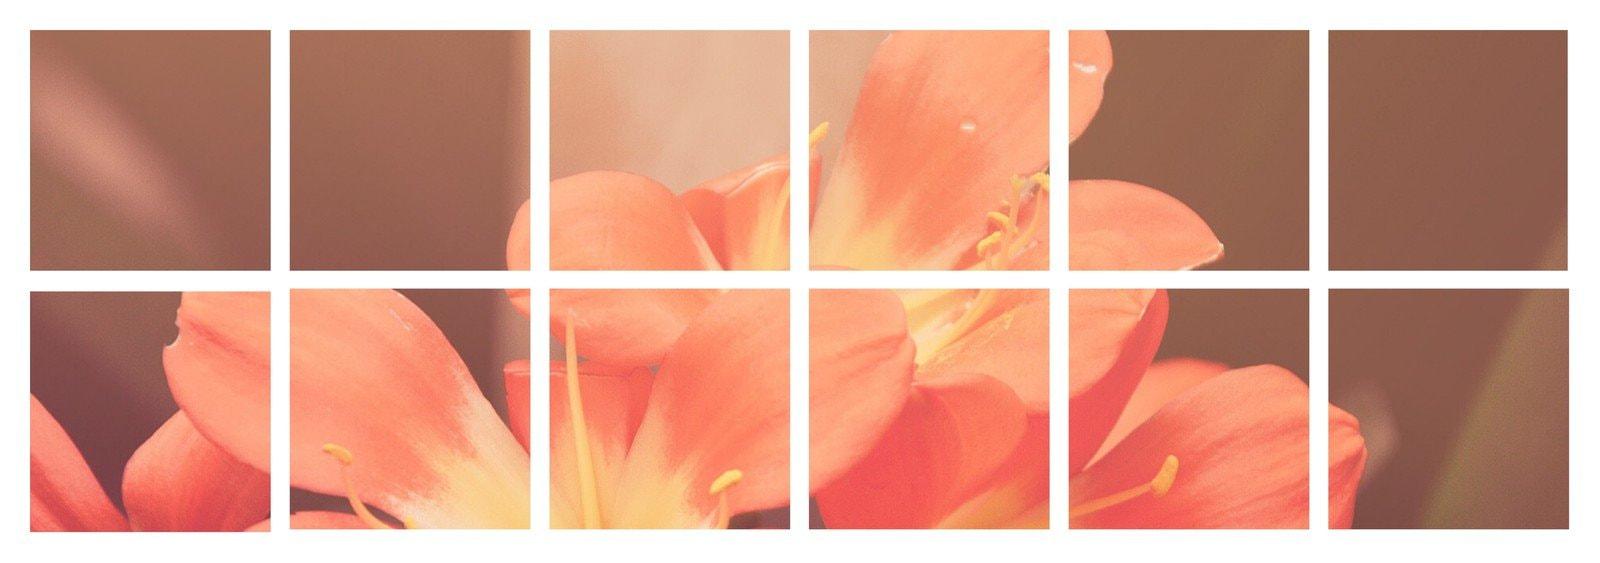 Floral Grid Tumblr Banner